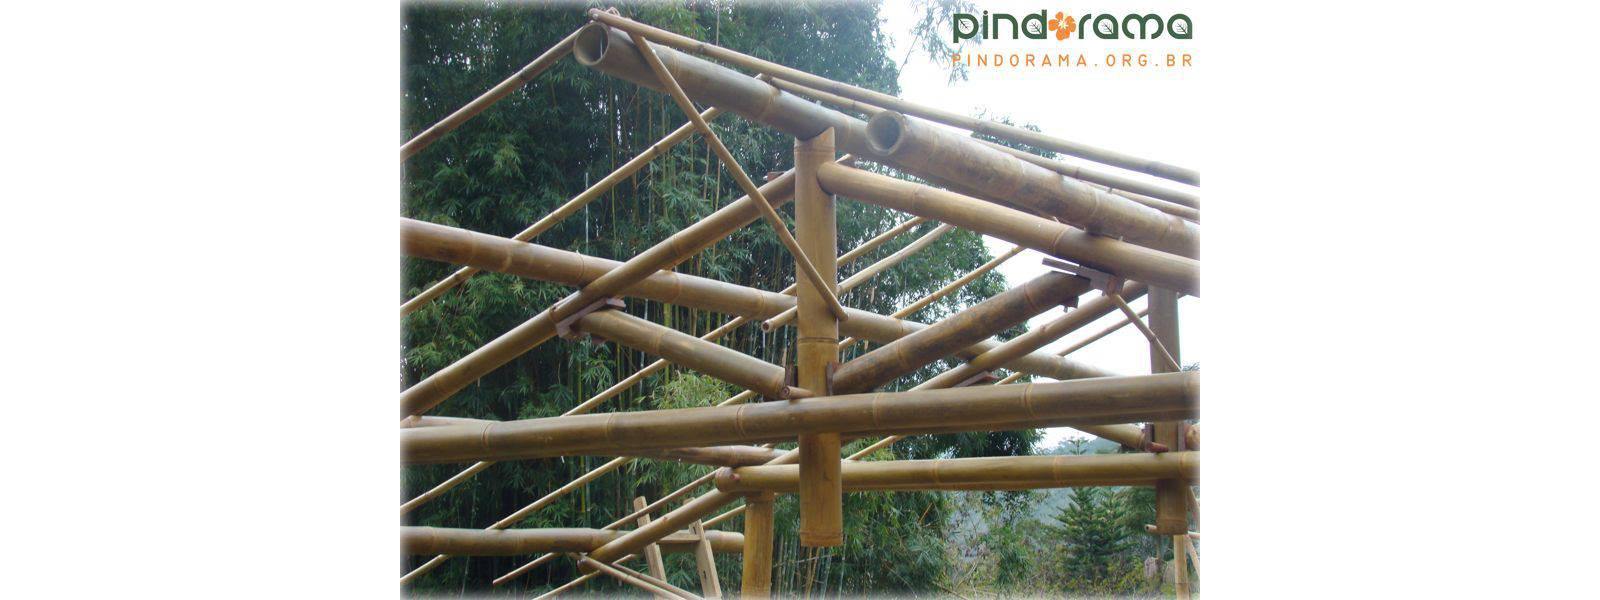 pindorama-curso-bambu